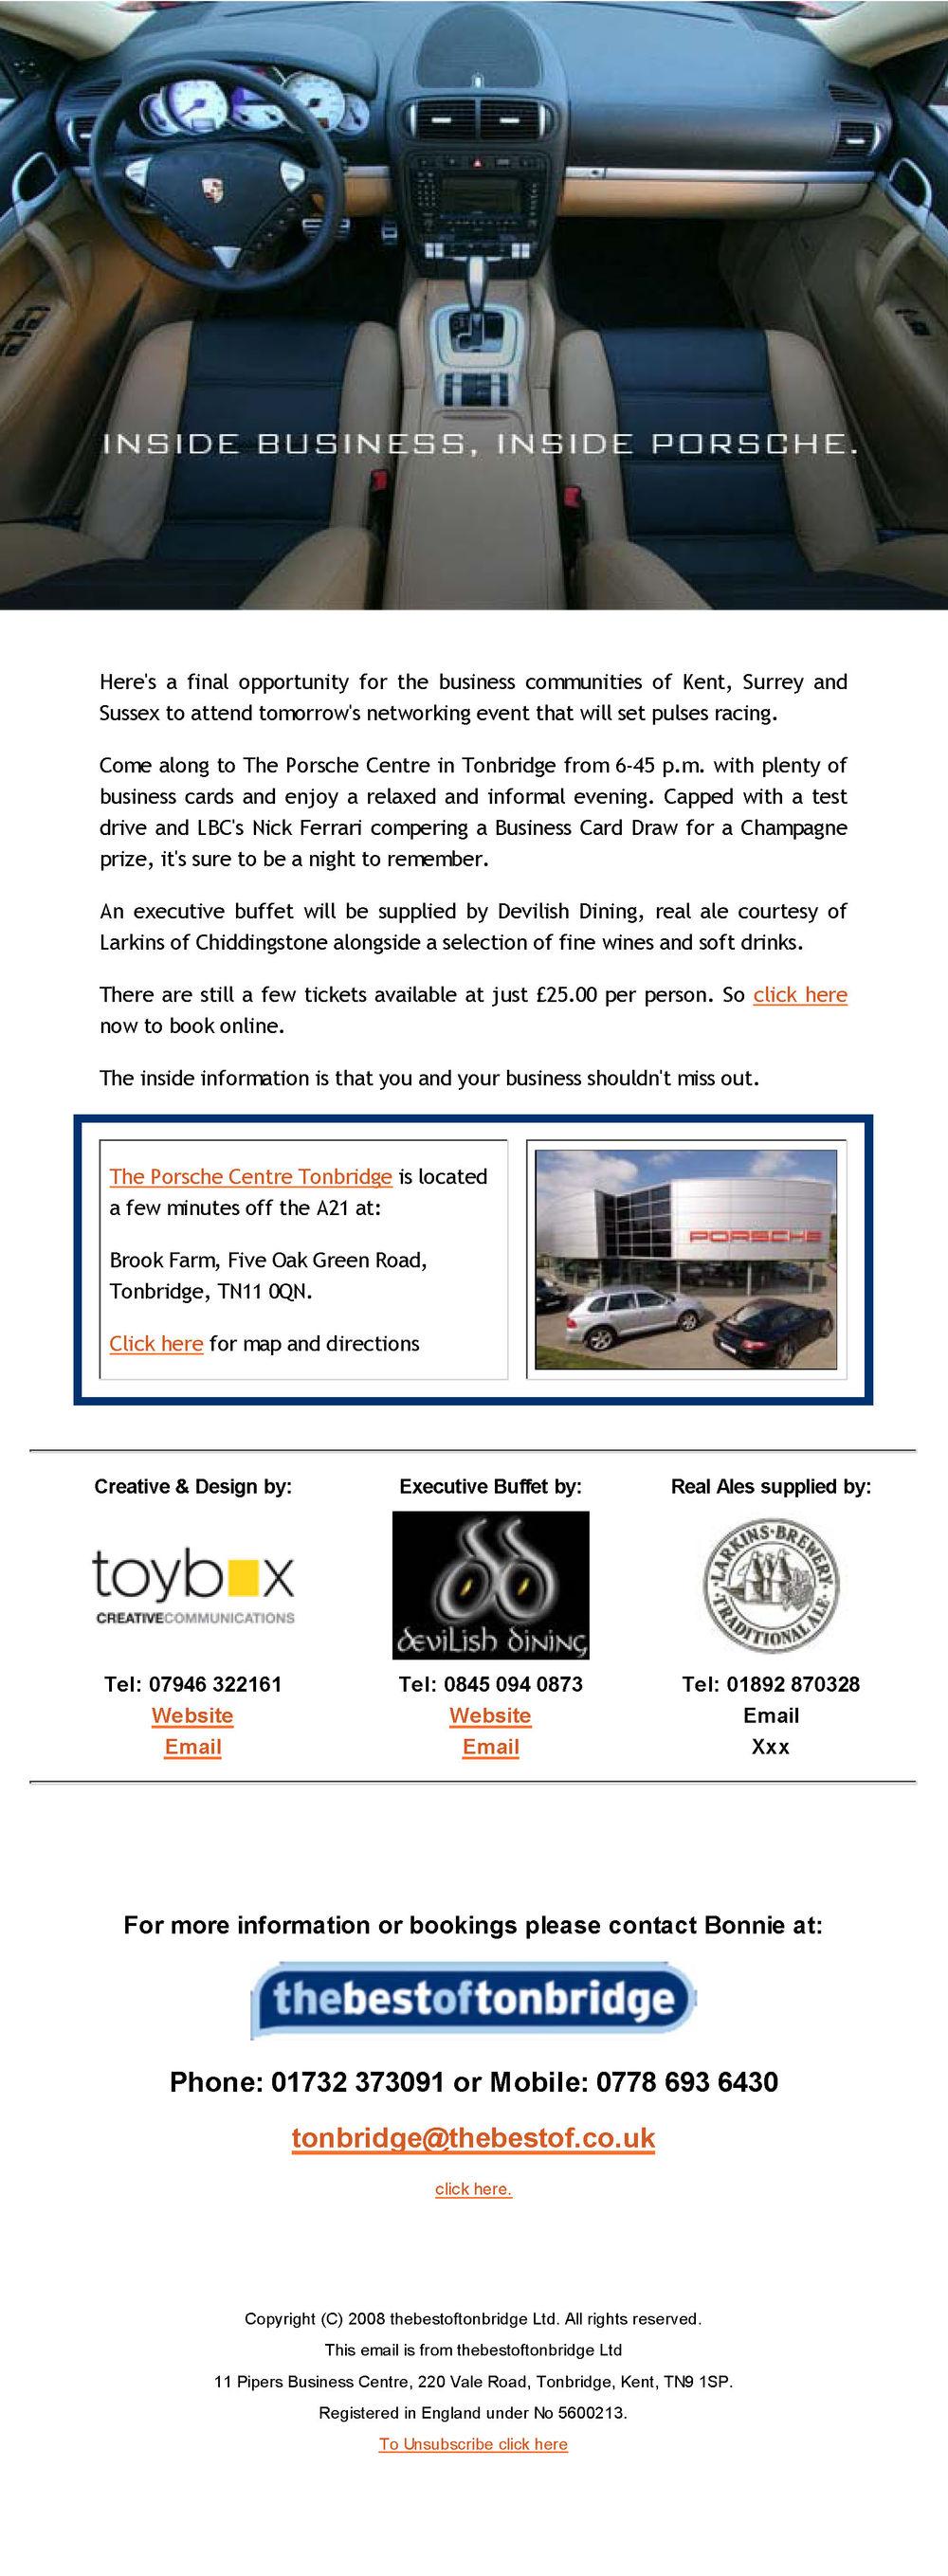 toybox_creative_porsche_best_of_tonbridge_email_campaign_Page_3.jpg